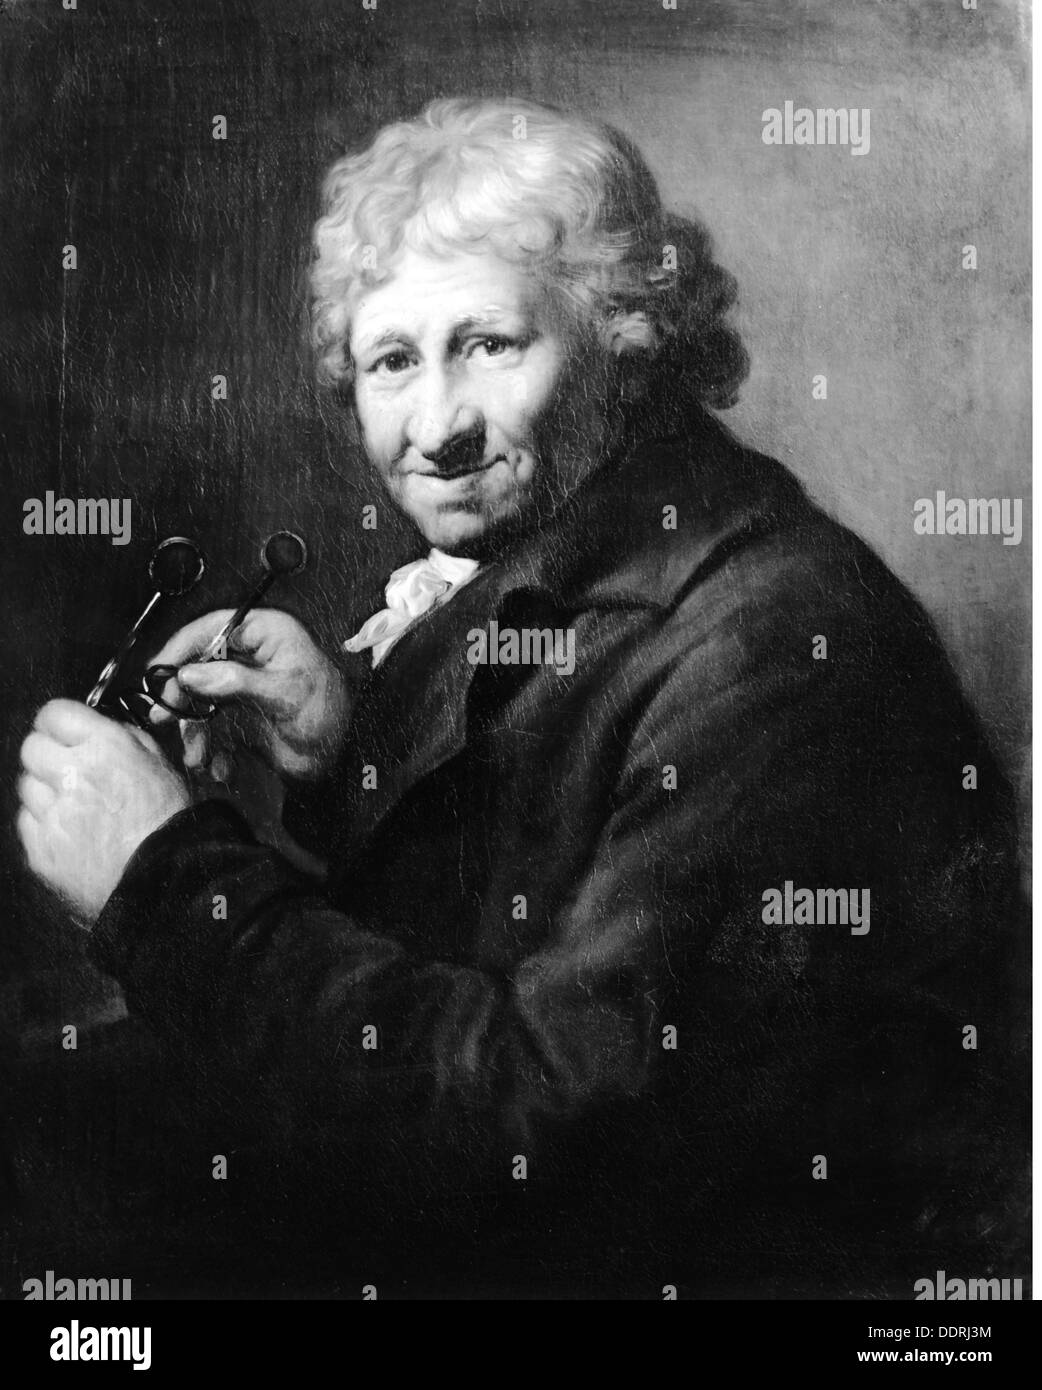 fine arts Graff Anton (1736 - 1813) painting ' Daniel Chodowiecki' German baroque gallery Augsburg 18th - Stock Image